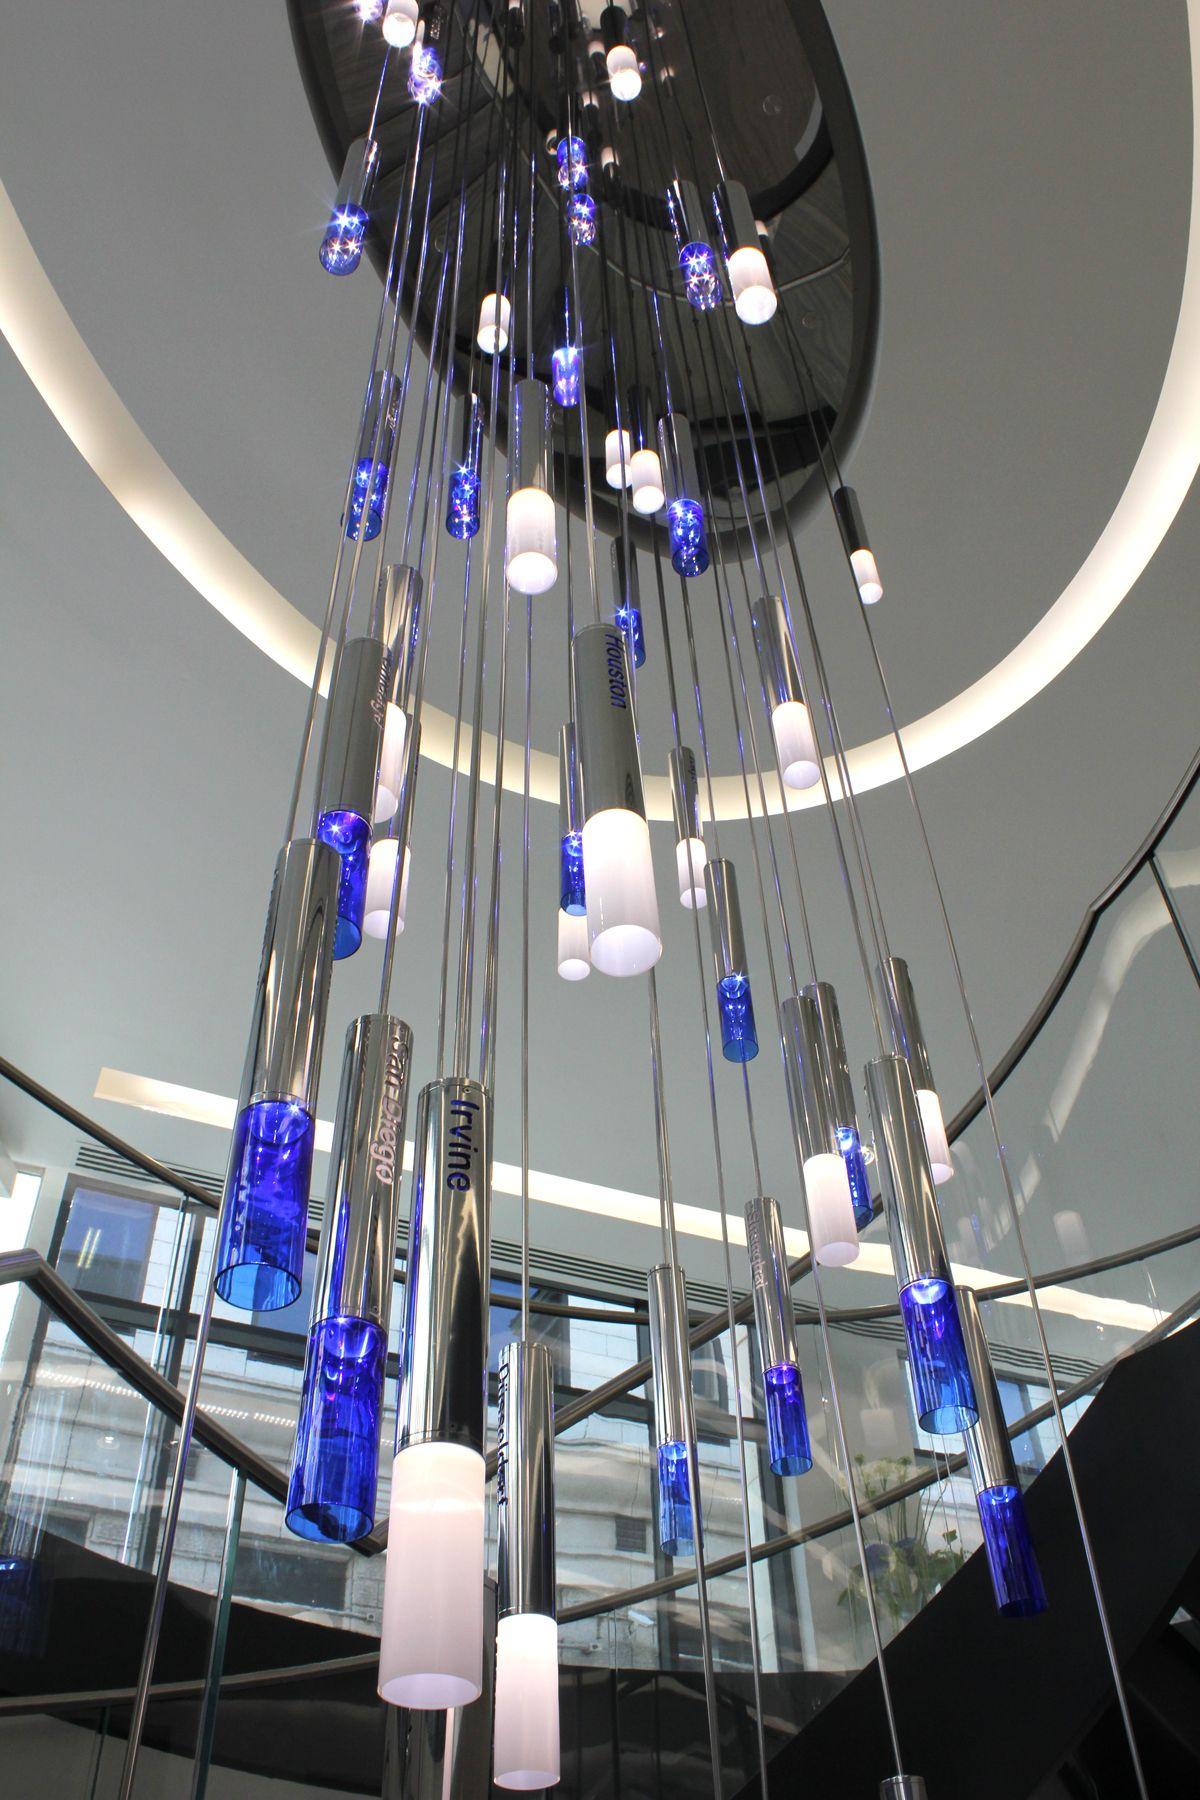 Bespoke atrium chandelier jones day london commercial office bespoke atrium chandelier jones day london commercial office lighting bespoke lighting design manufacture arubaitofo Images